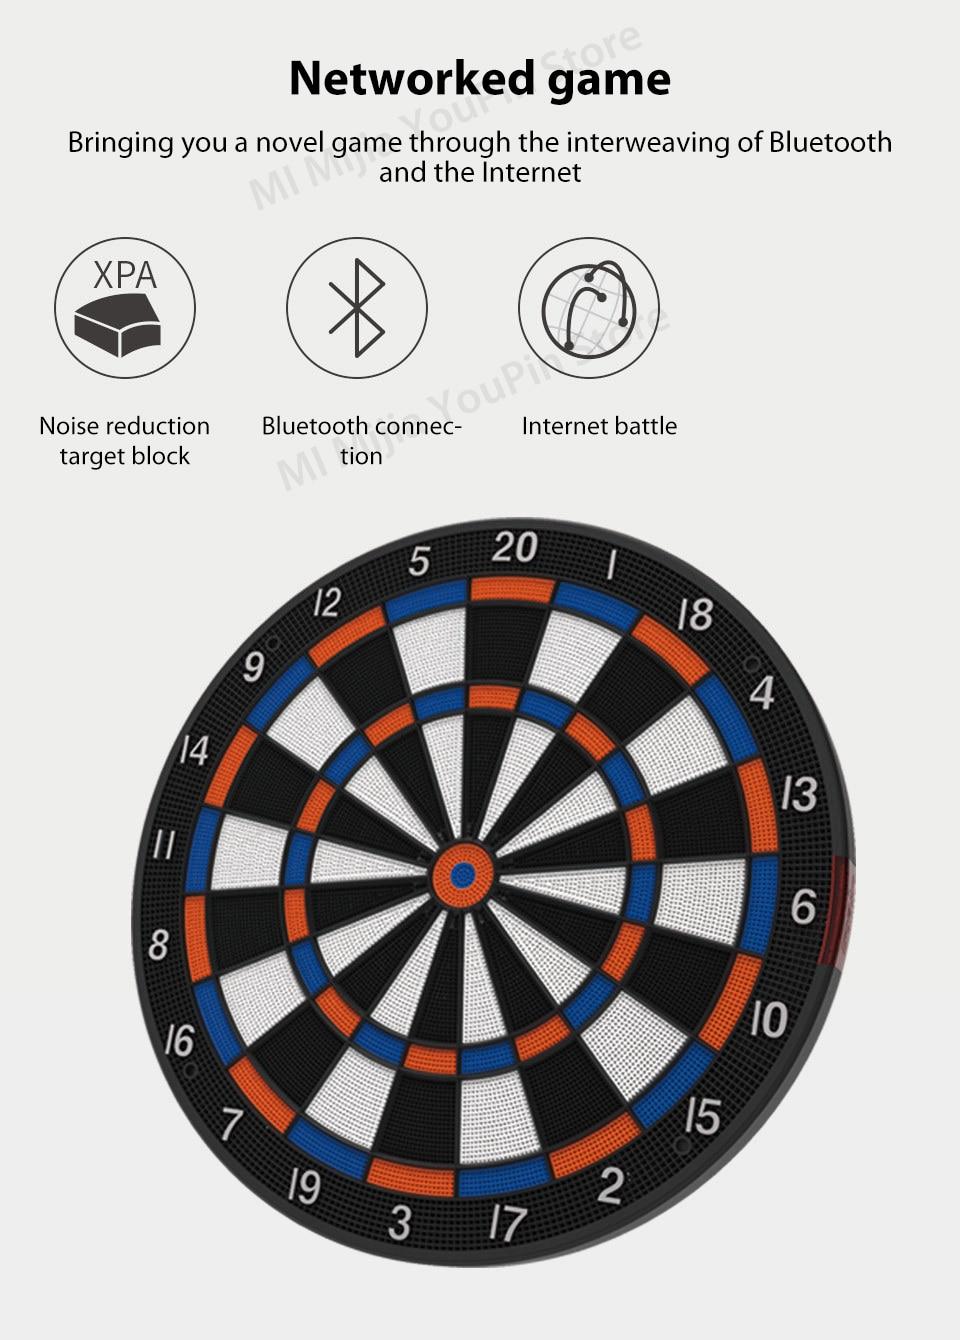 Xiaomi Youpin SDB Smart Dart Target Youth Edition A1 Bluetooth Connect Internet Share Data Enjoy Battle Search Smartdartboard (5)